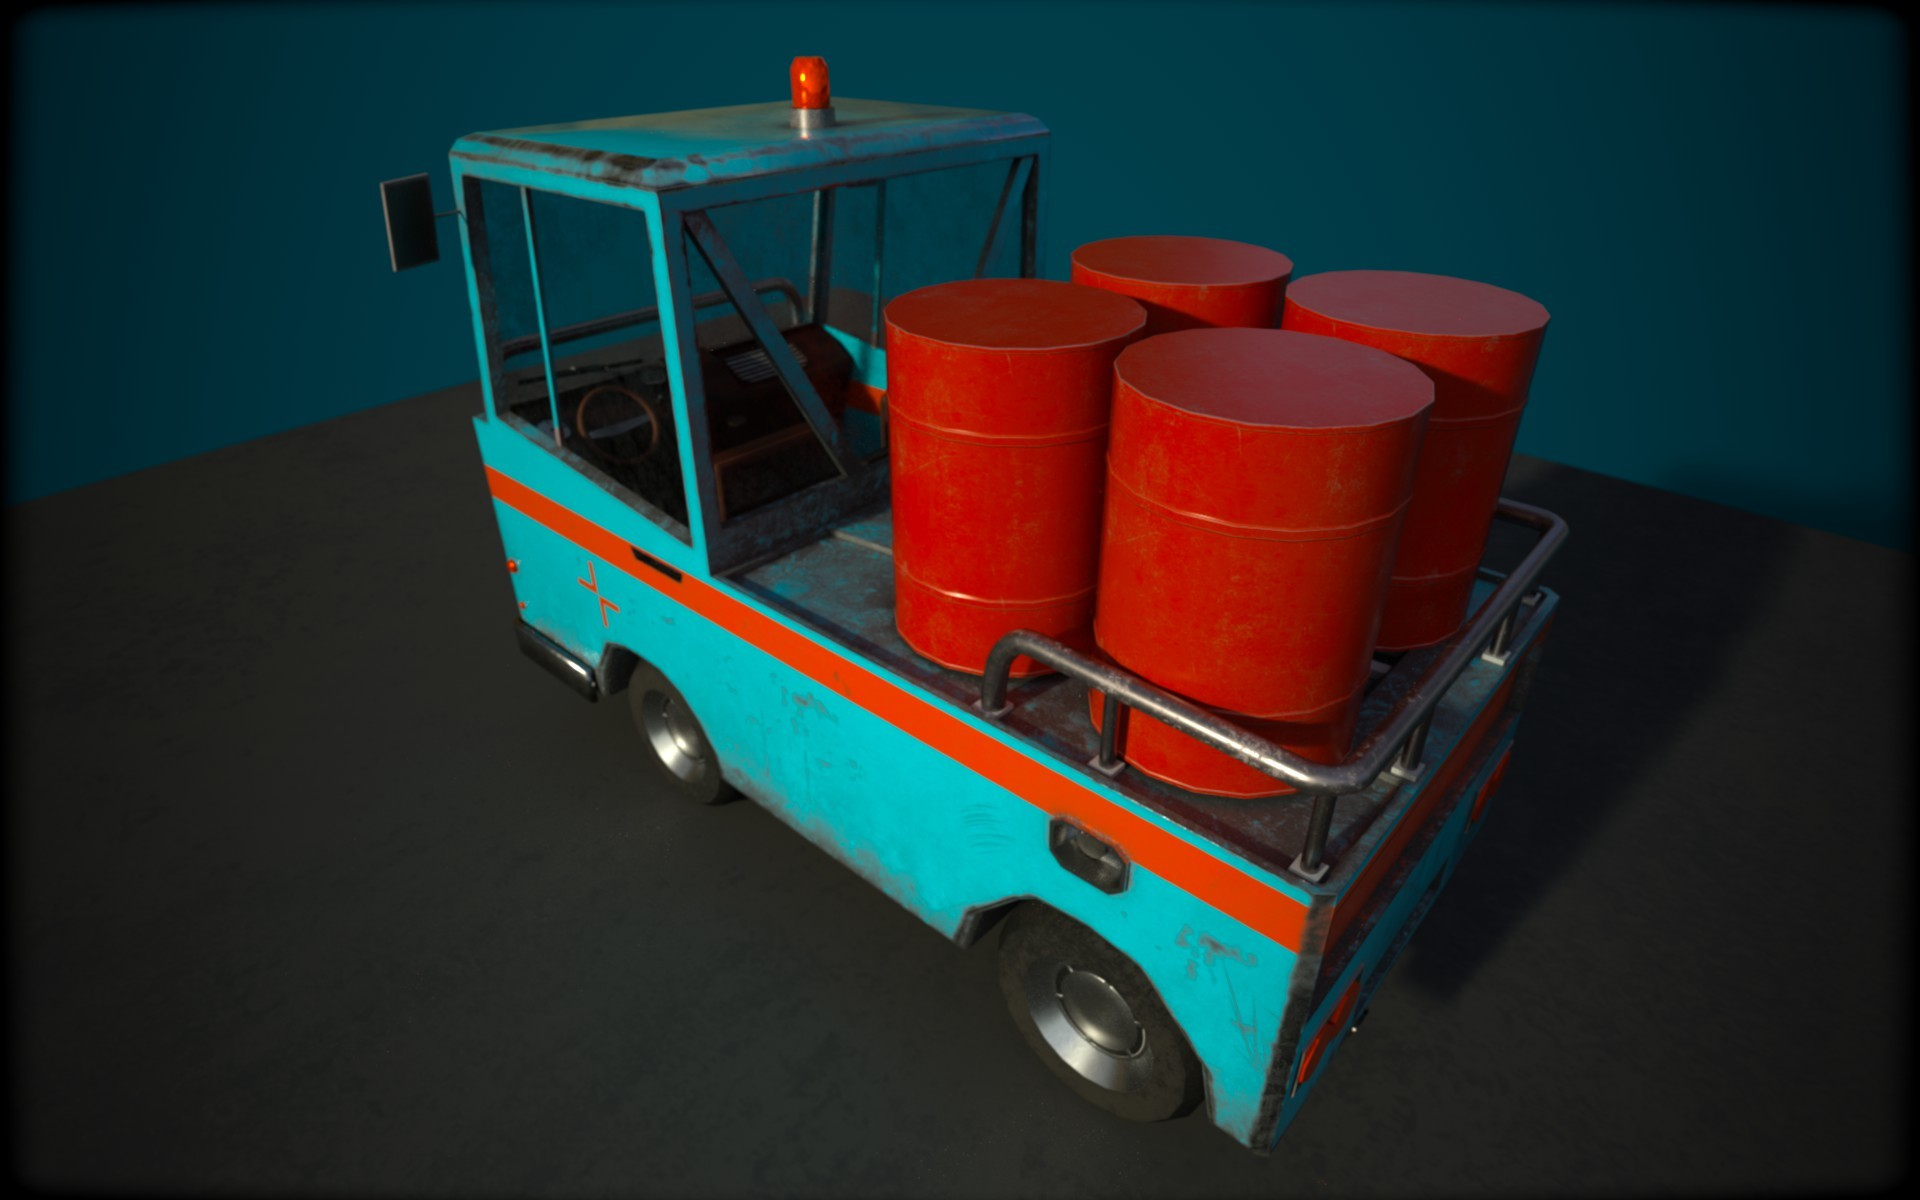 Dani palacio santolaria little truck 02